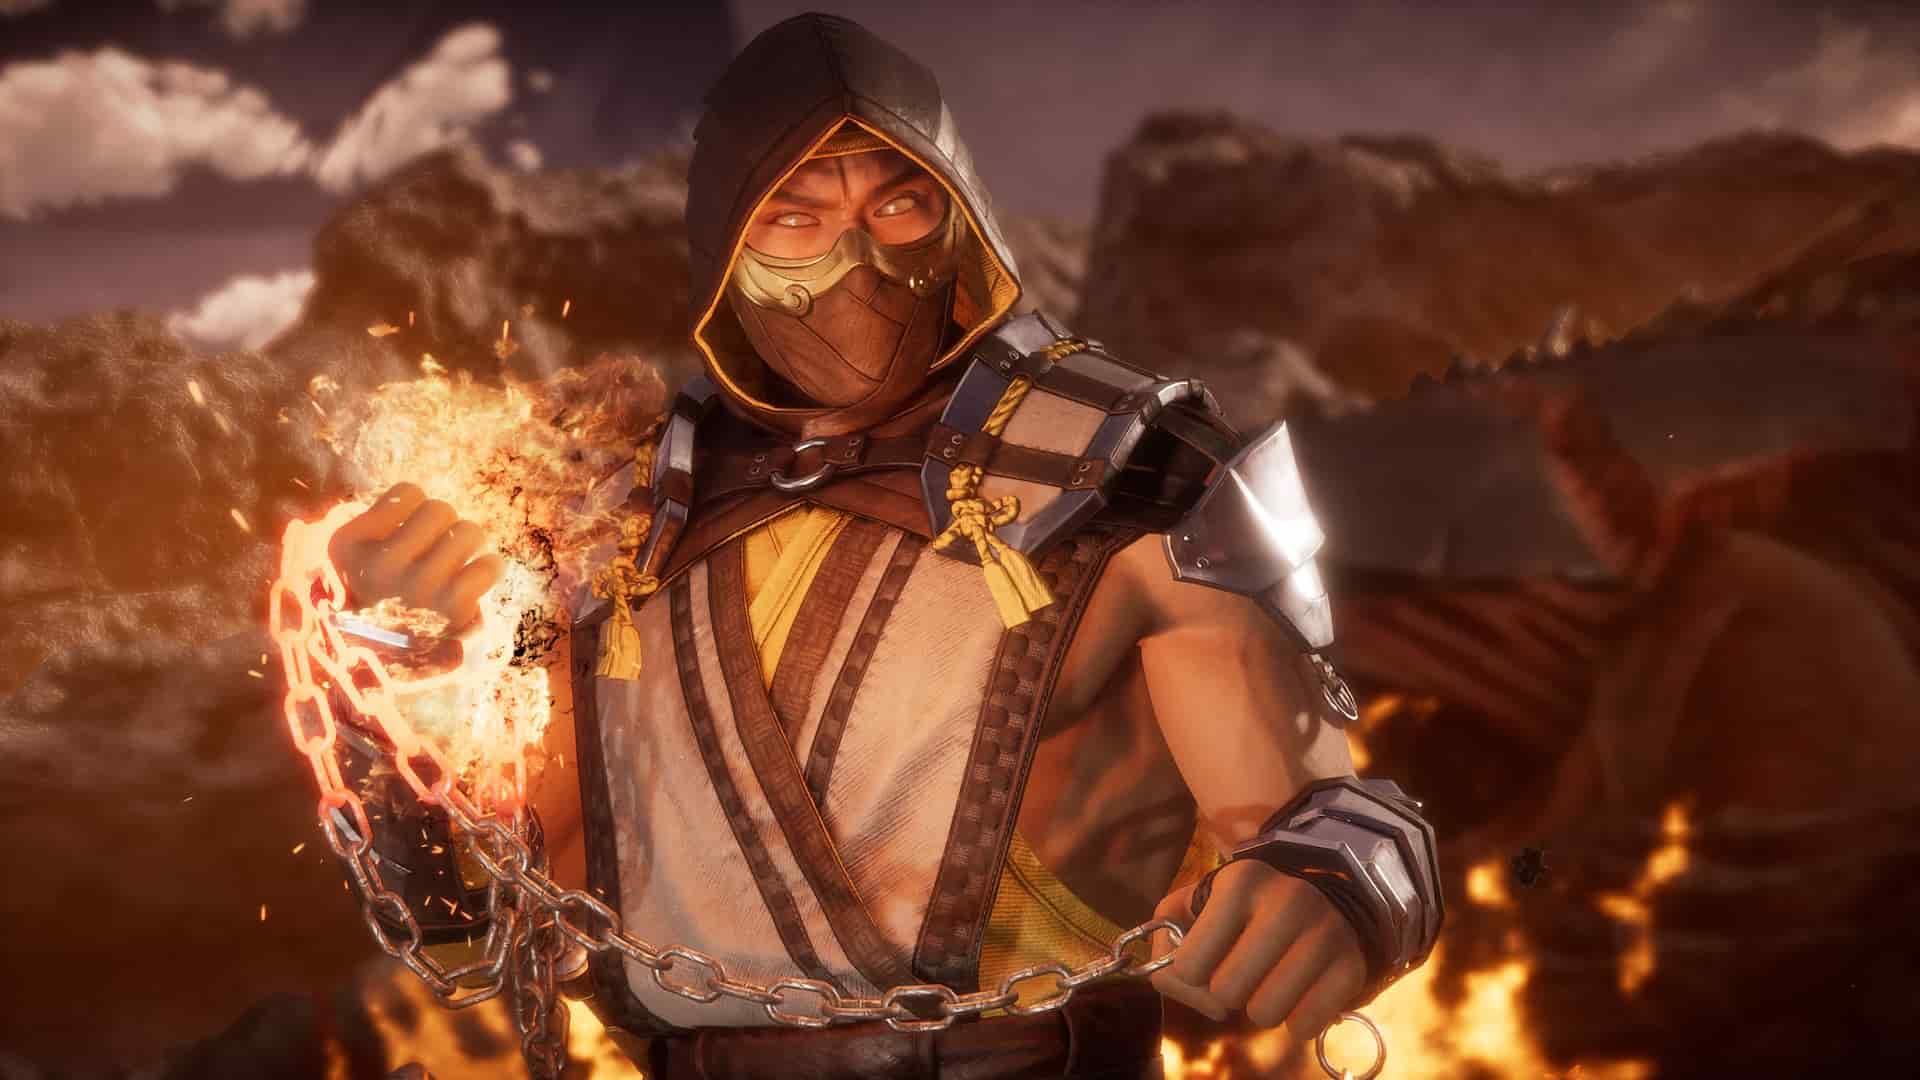 Mortal kombat 11 review playstation universe - Mortal kombat 11 wallpaper ...